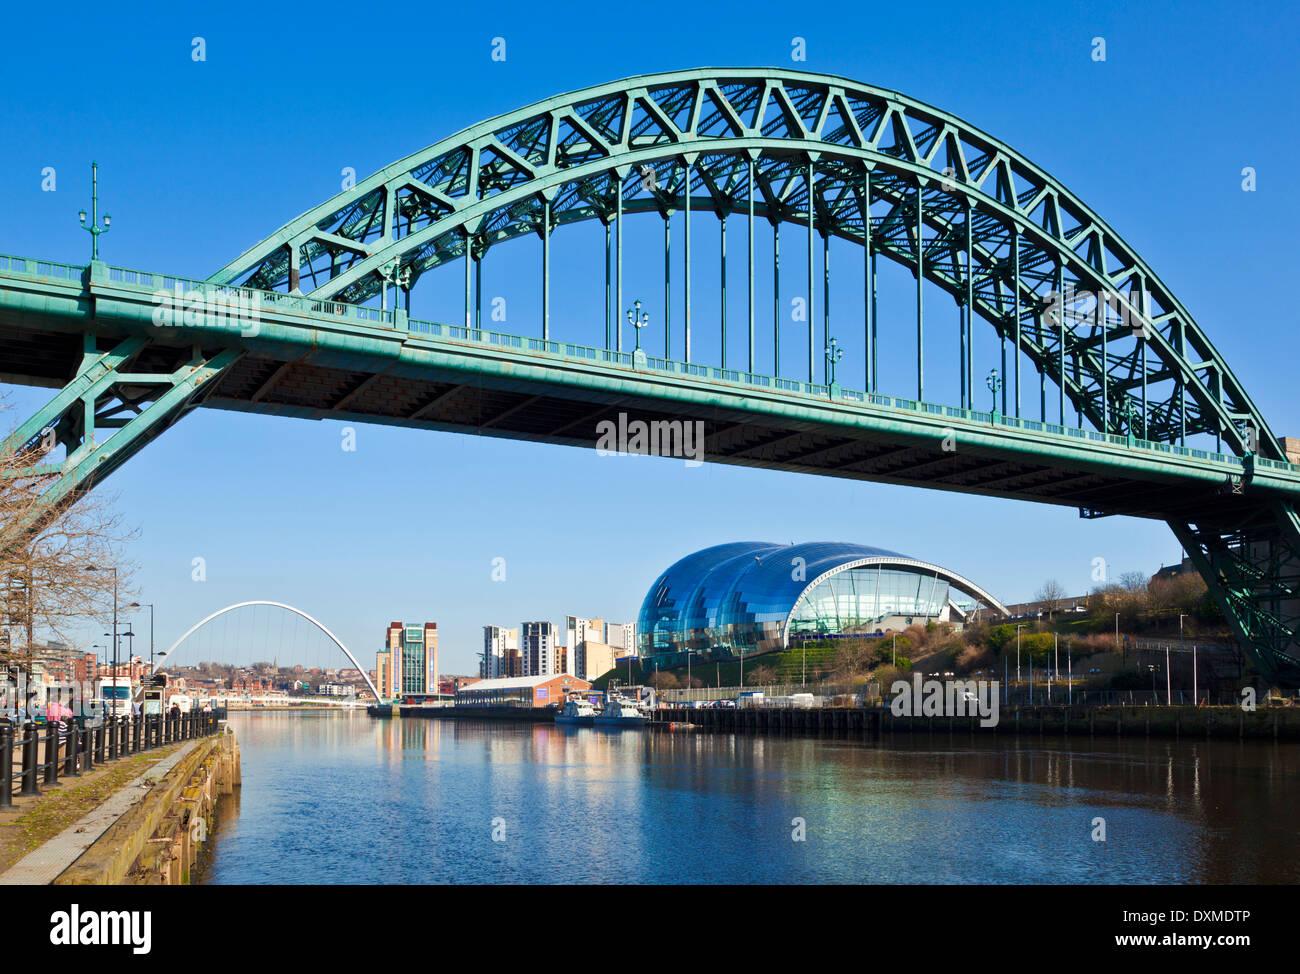 Newcastle upon Tyne skyline gateshead the Tyne bridge over River Tyne Tyne and Wear Tyneside England UK GB EU Europe Stock Photo